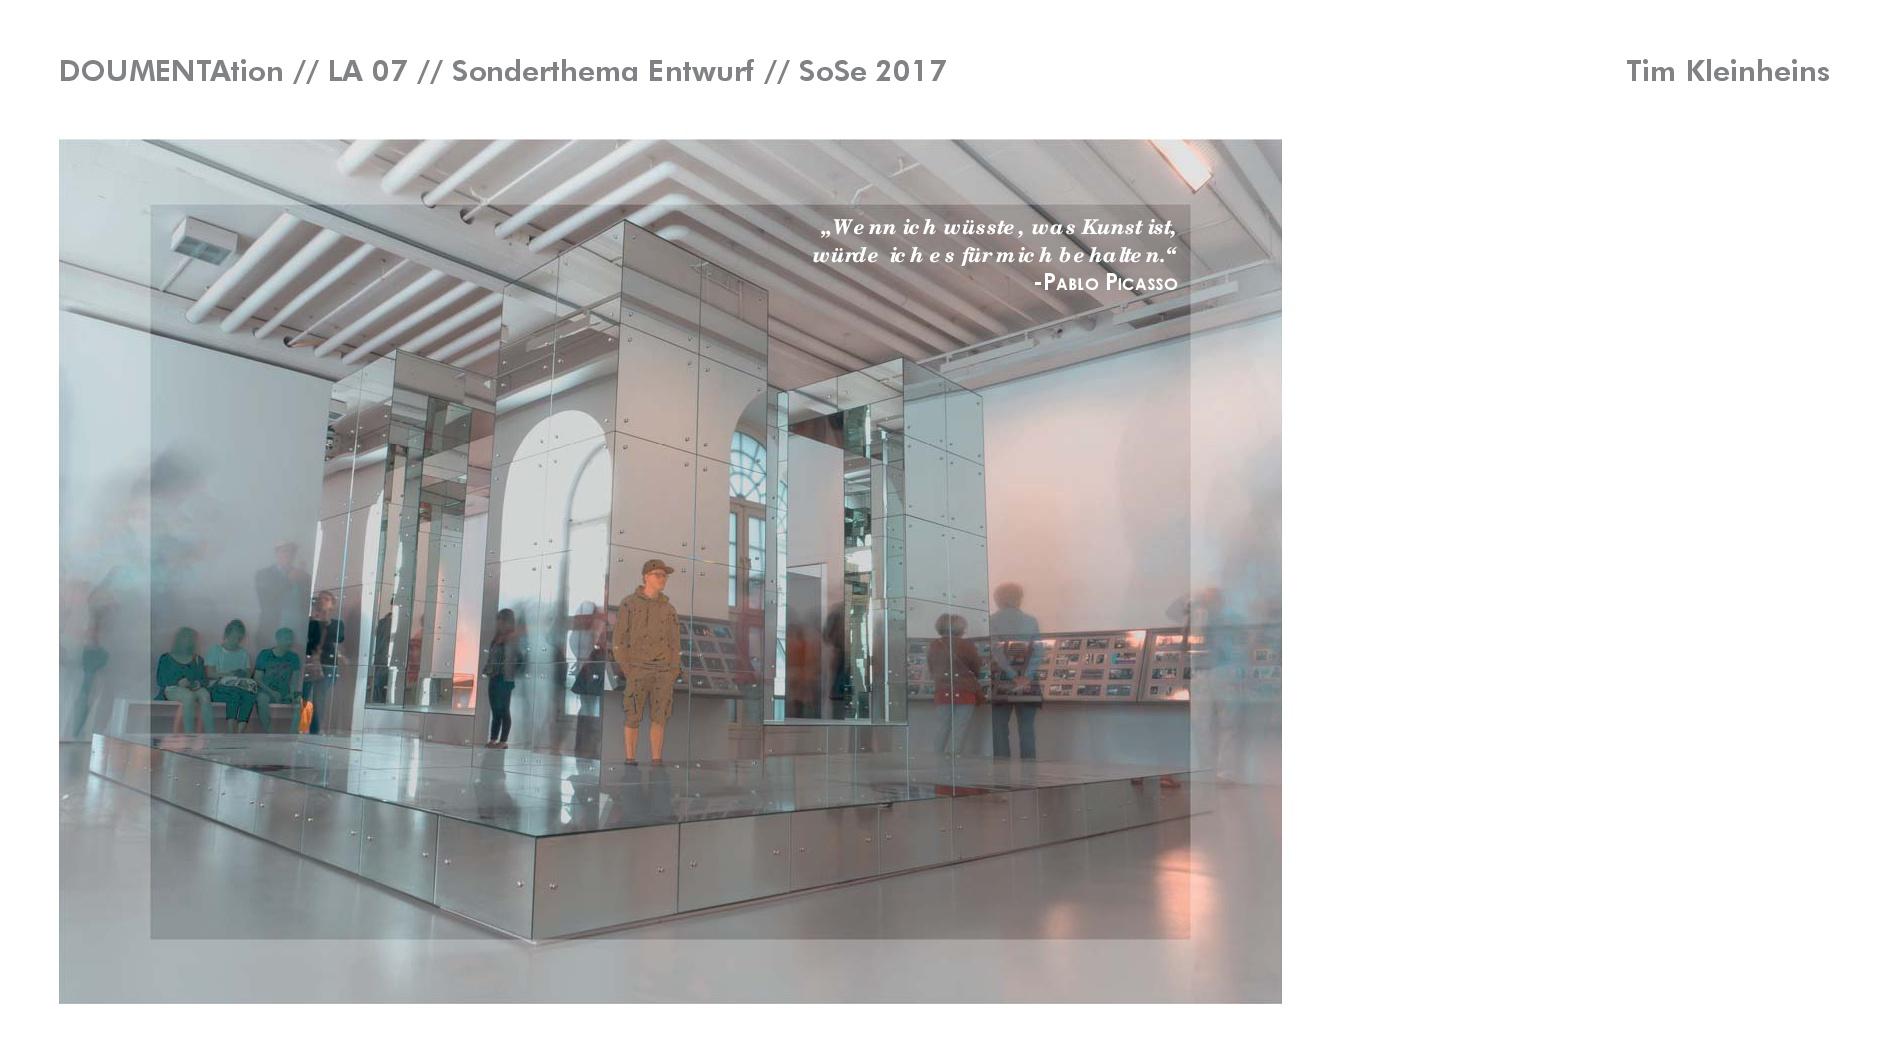 NEU Sonderthema Entwerfen SoSe 17 006